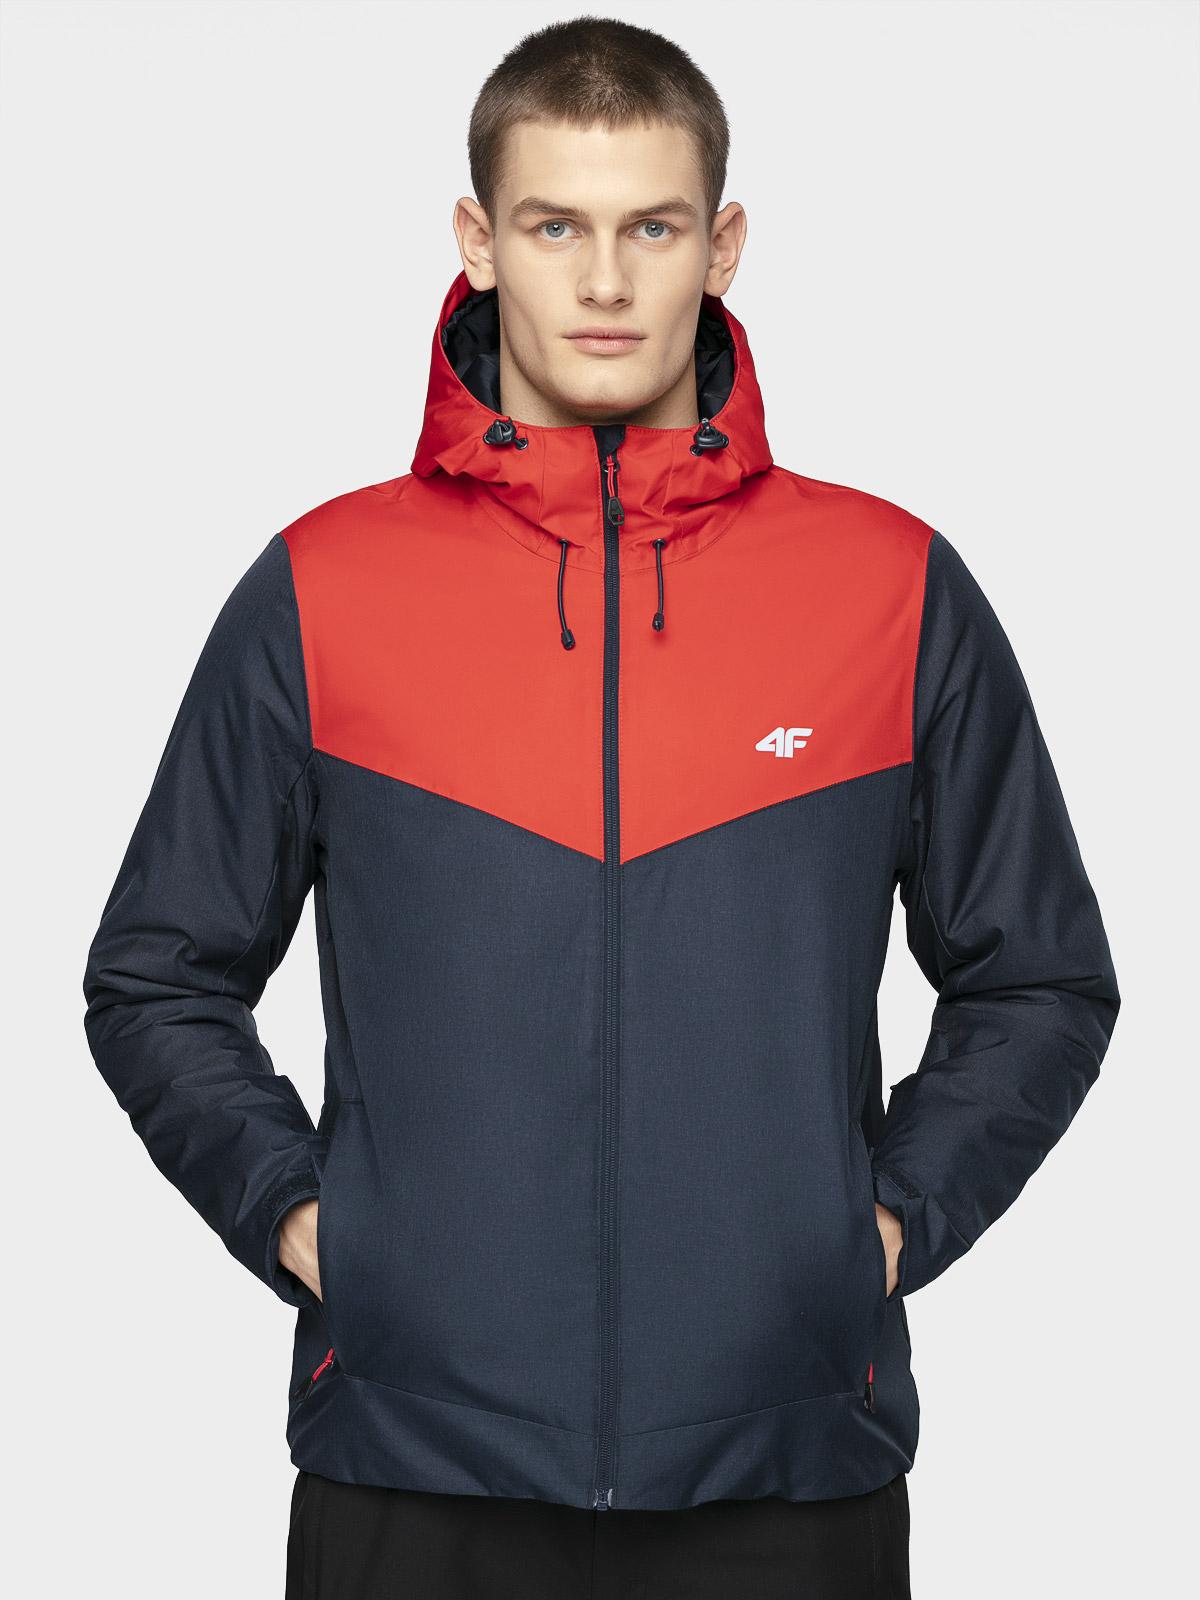 Kurtka narciarska męska